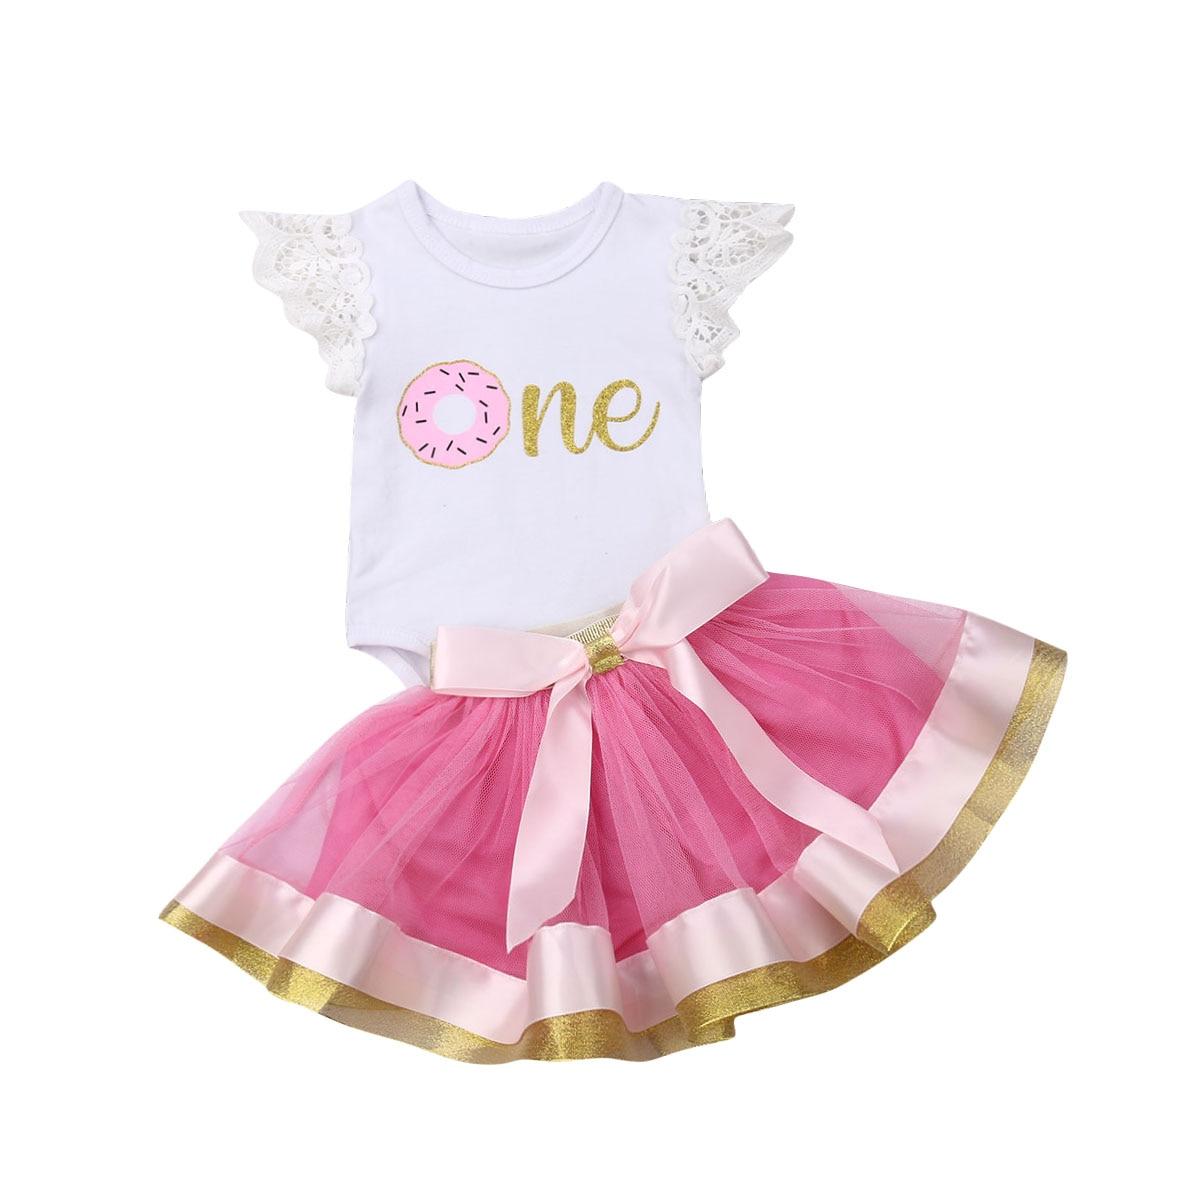 2pcs Toddler Baby Girl Headband+Romper Bodysuit Tutu Dress Set Outfit Party Tops